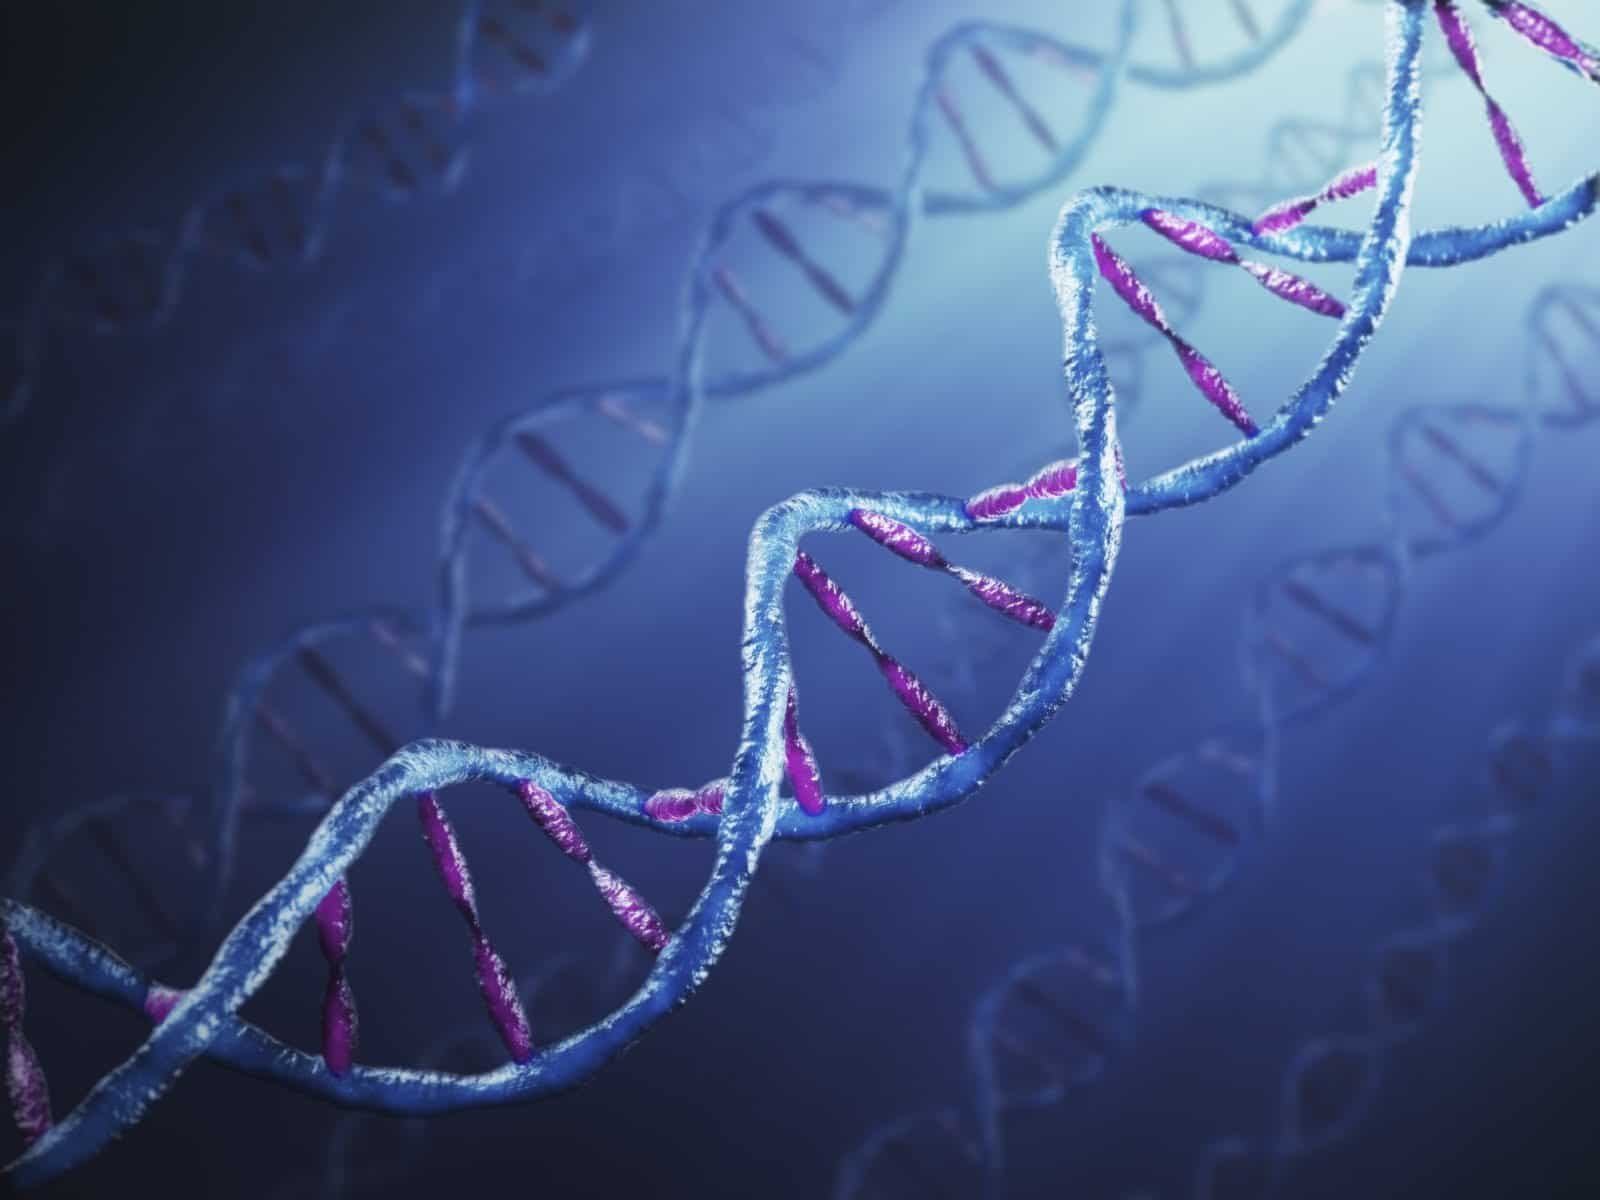 FTDNA Ancestry DNA 23andme raw data analysis interpretation tools